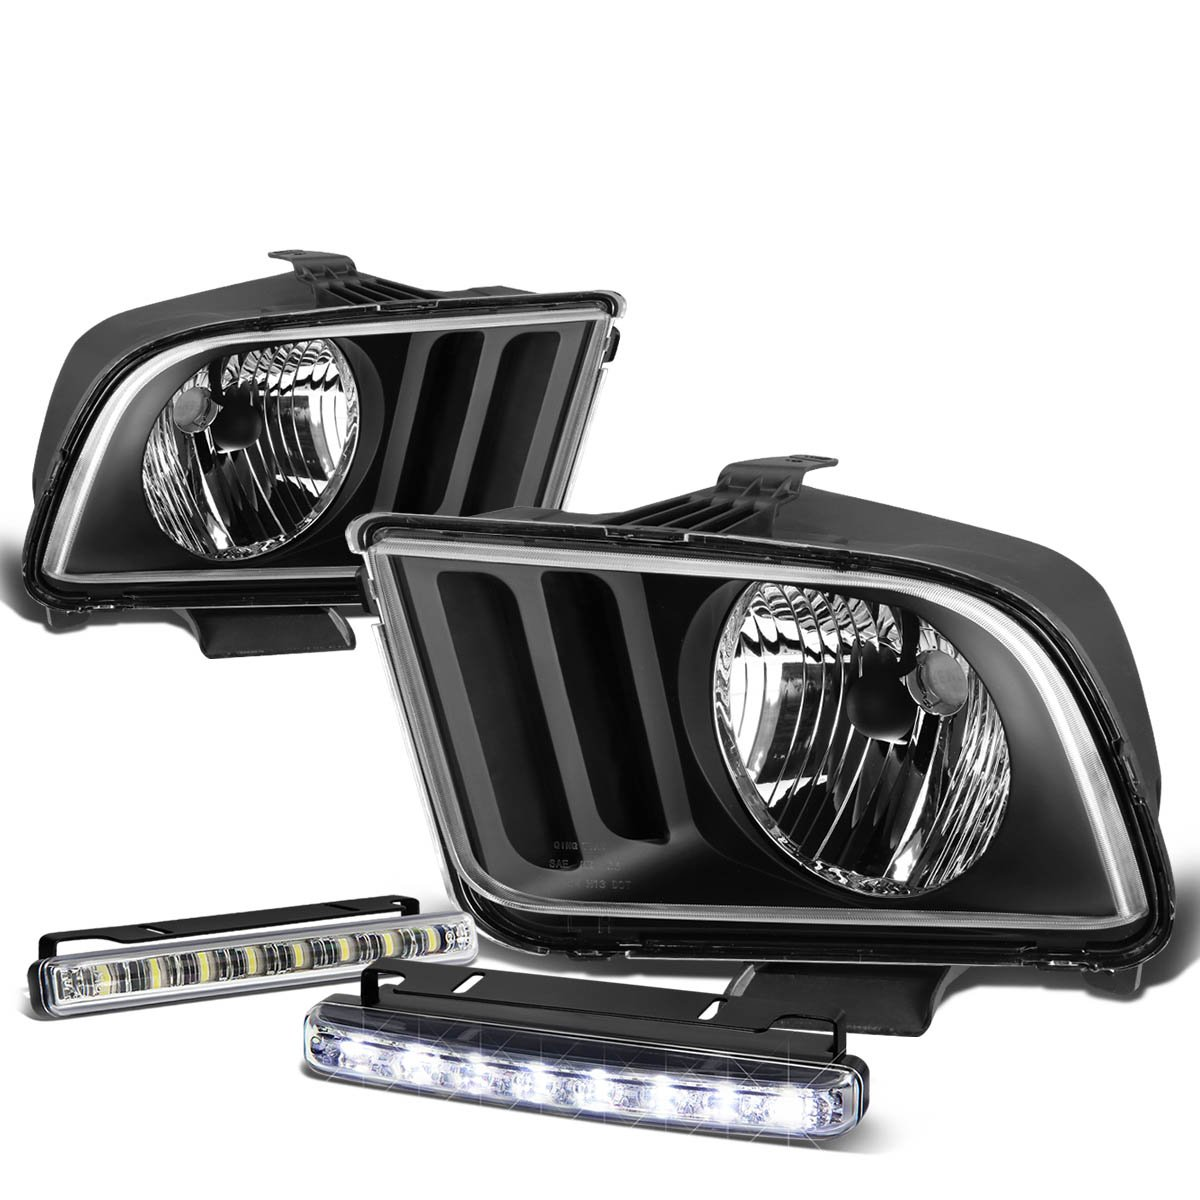 For Ford Mustang 5th Gen Pony Black Housing Clear Corner 1988 Fog Lights Headlight Drl 8 Led Light Automotive